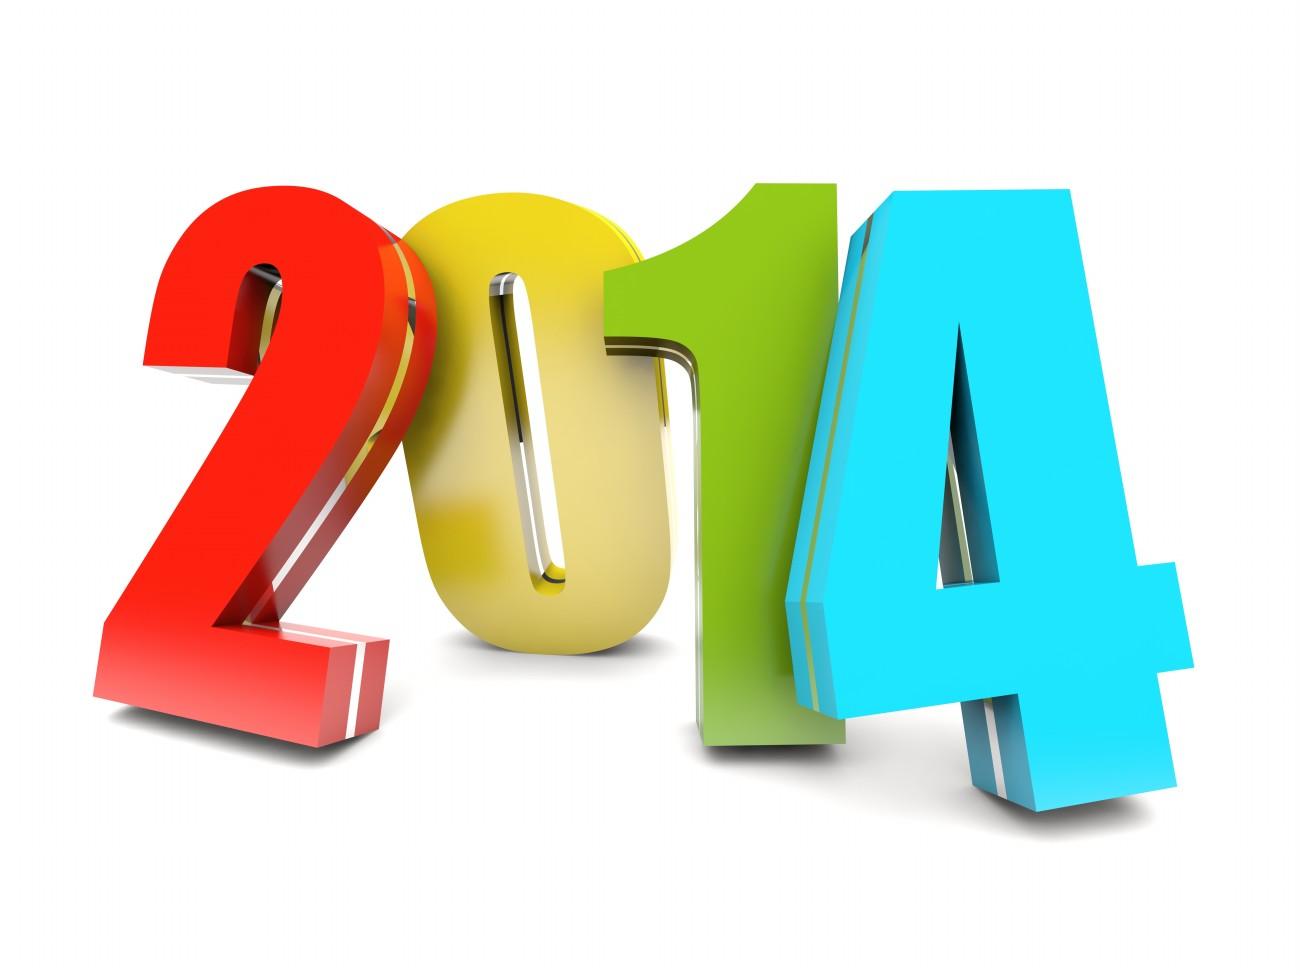 2014-Numbers-Happy-2014-Wallpaper-New-Year-Image.jpg